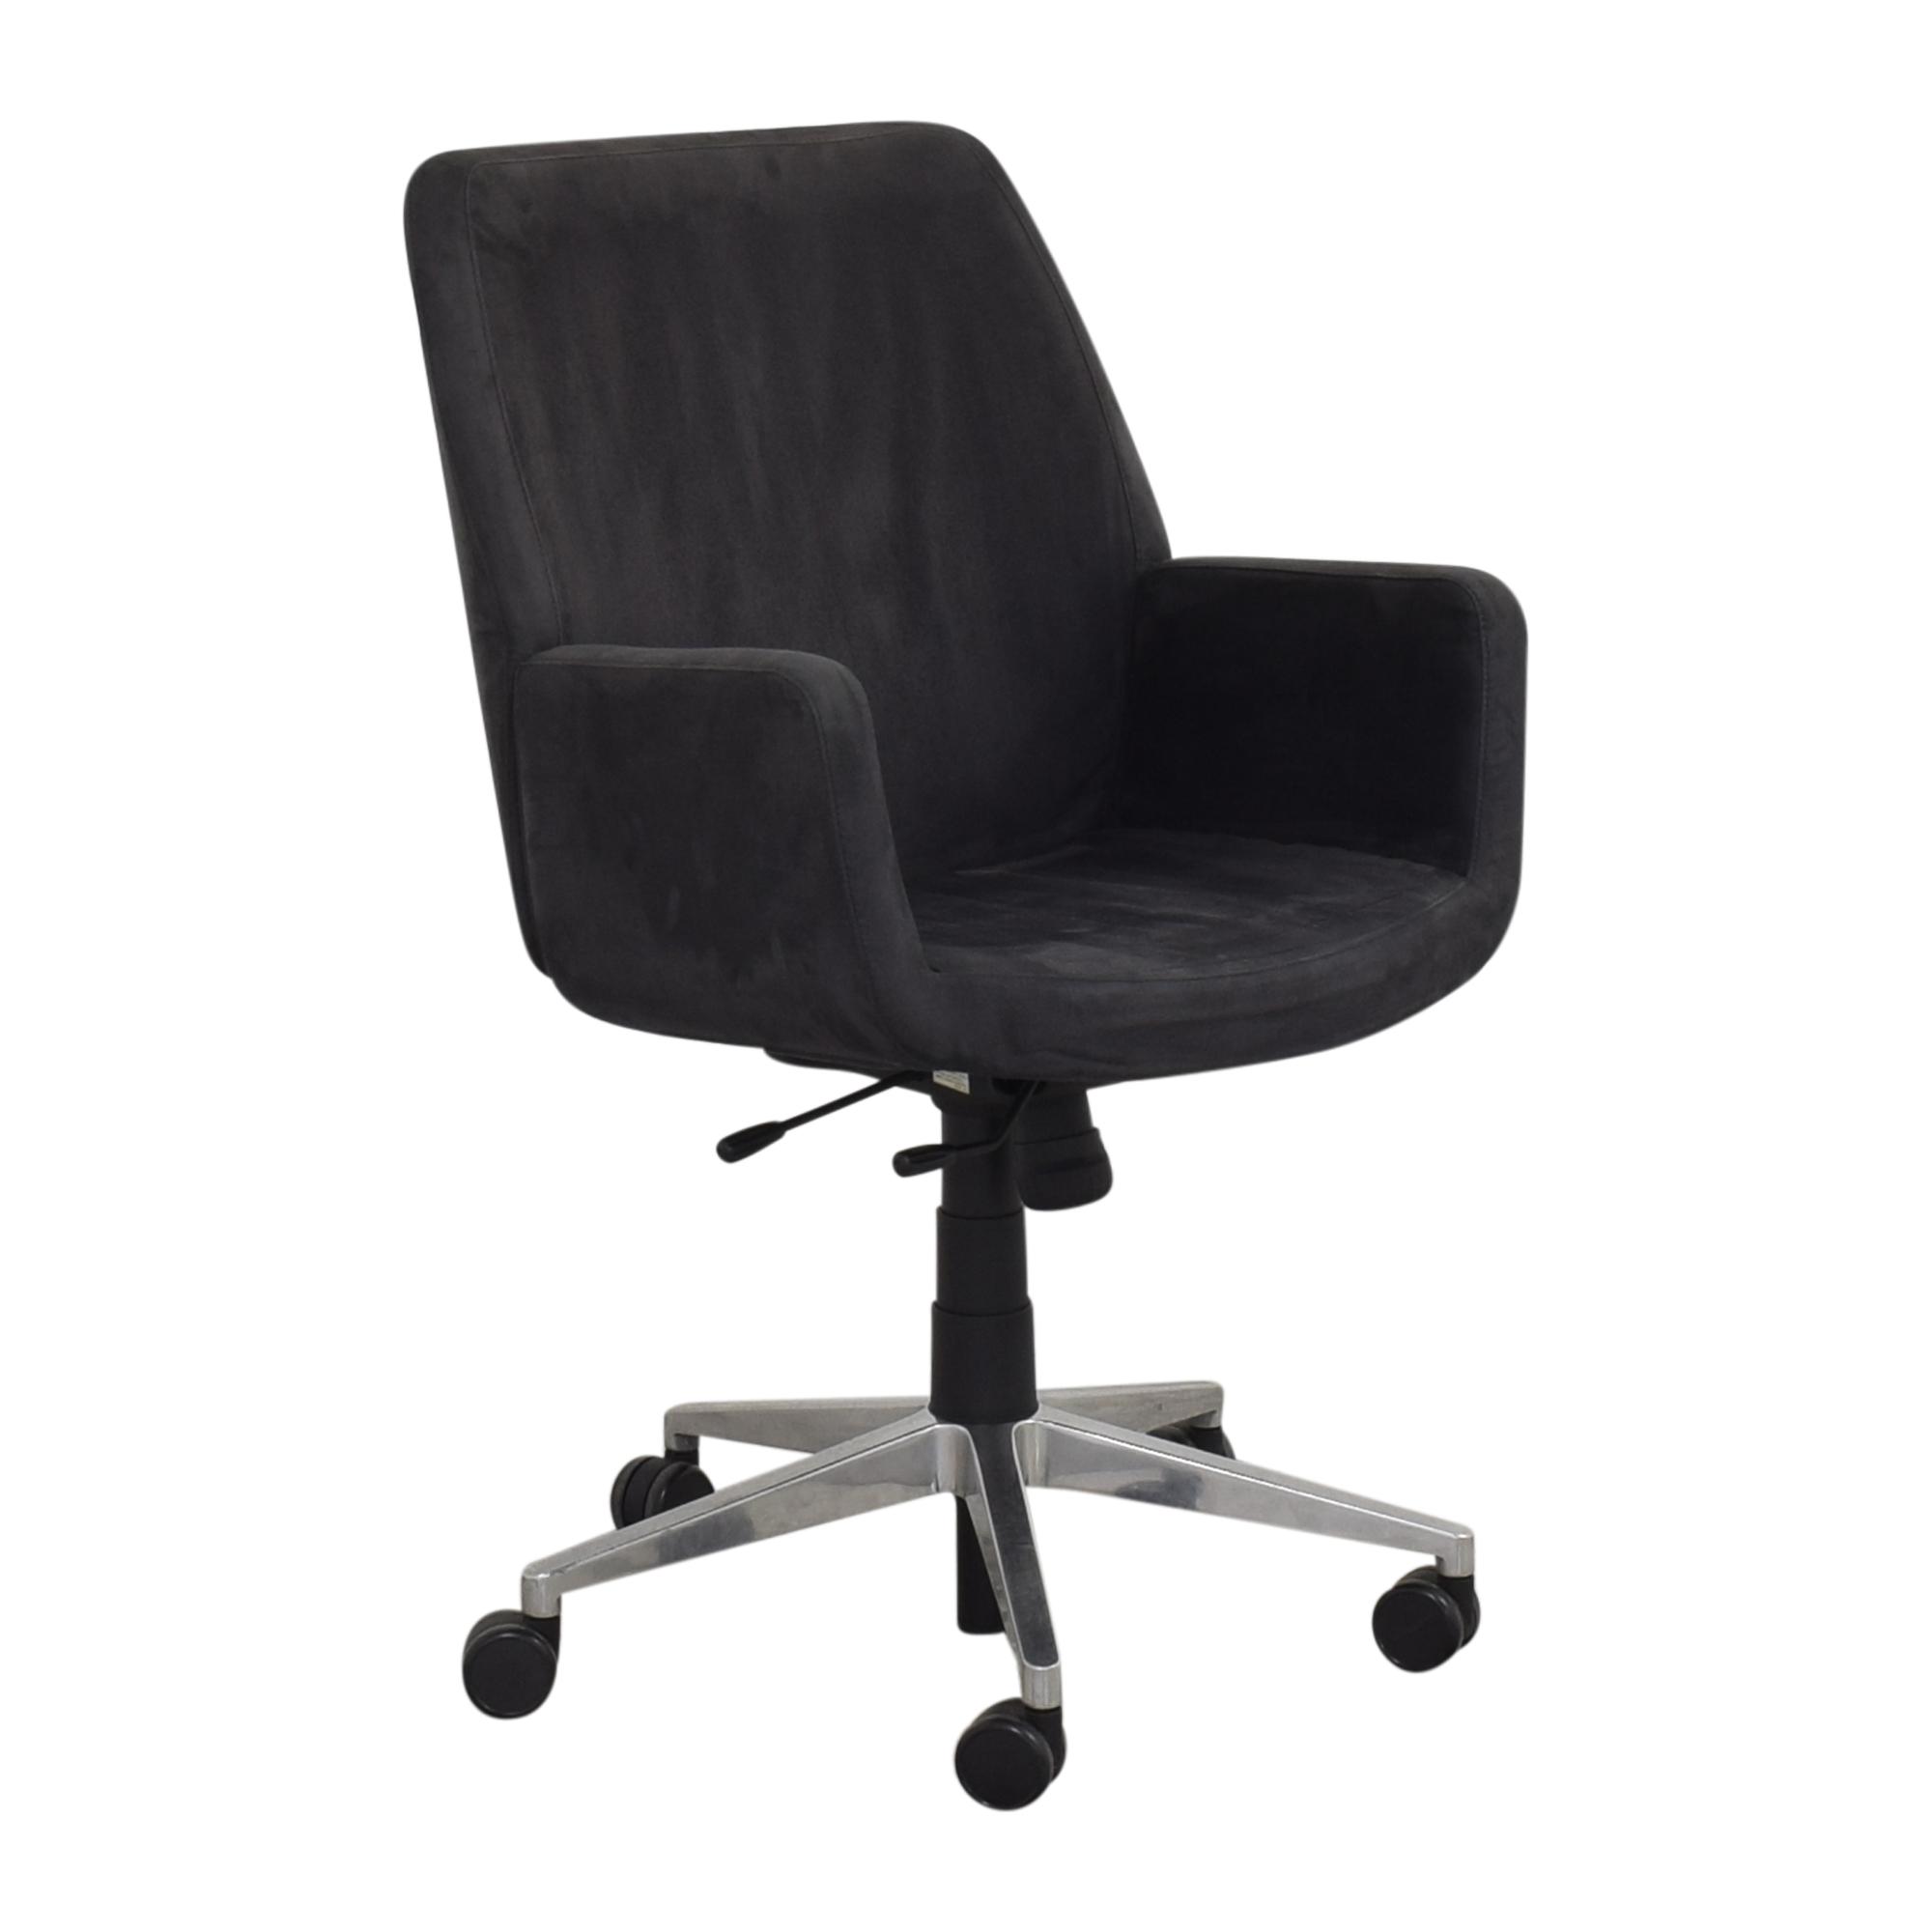 shop Steelcase Steelcase Coalesse Bindu Guest Chair online